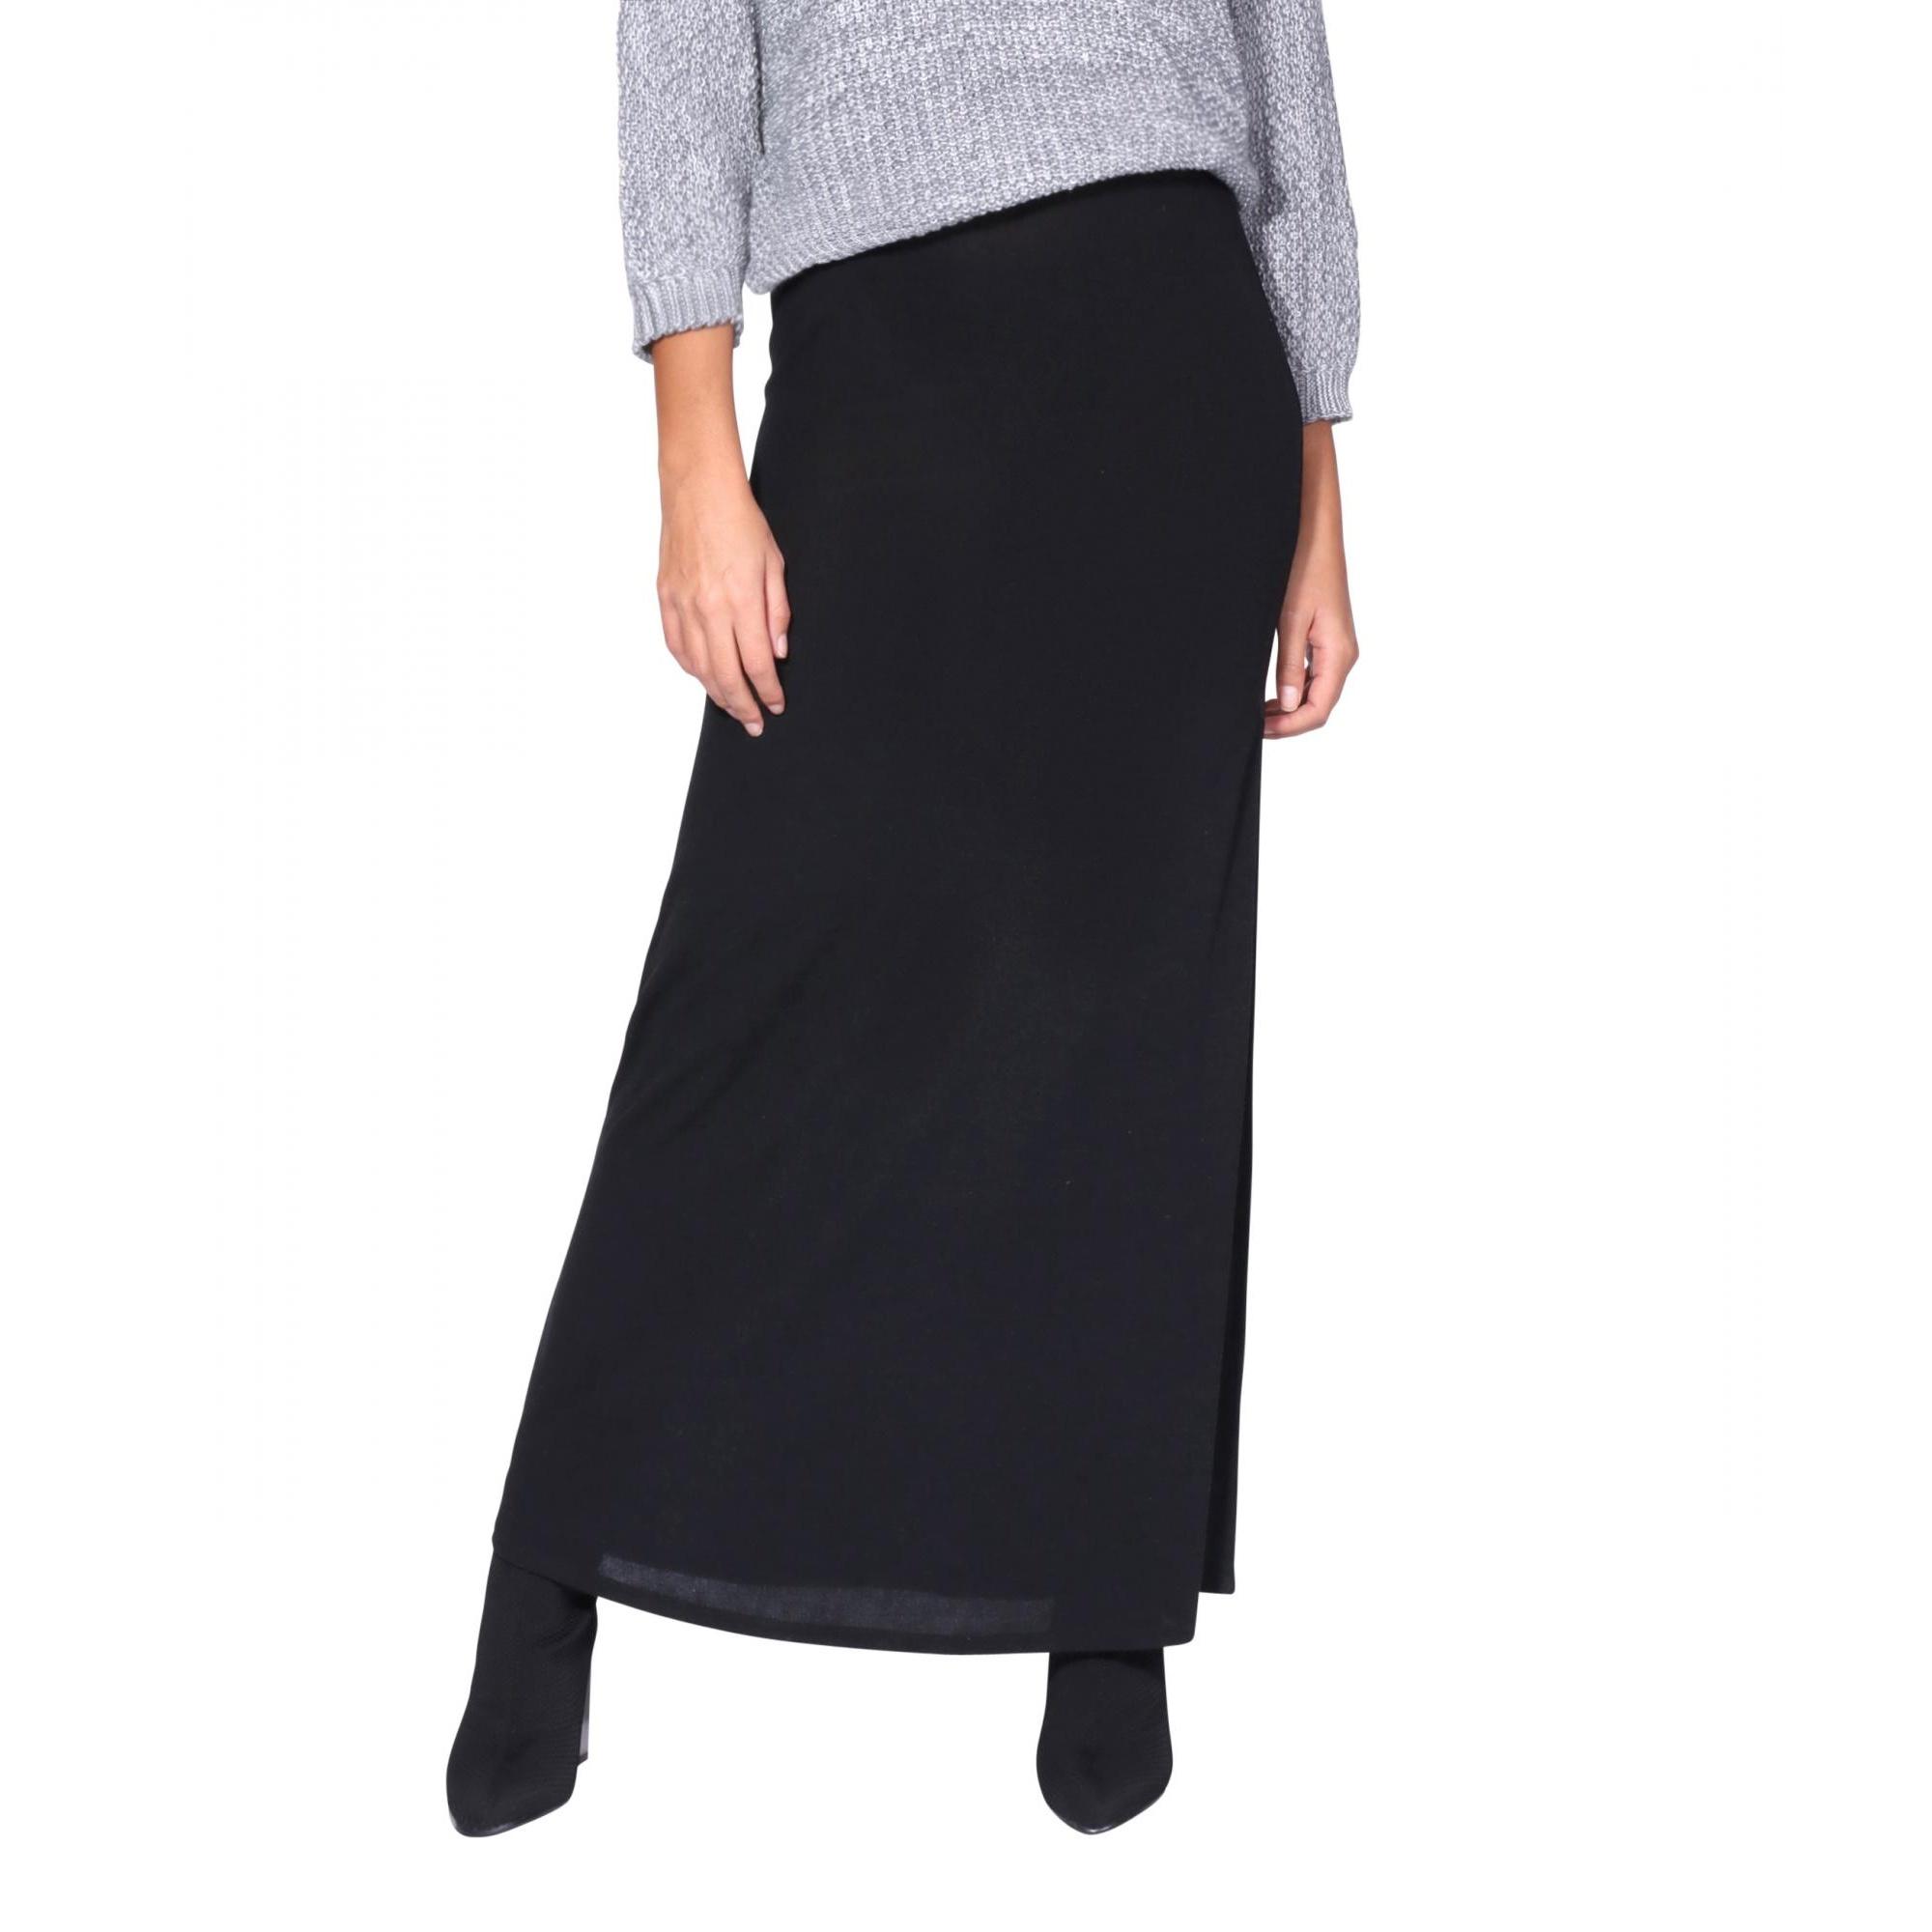 Krisp Womens/Ladies High Waist Maxi Skirt (8 UK) (Black)